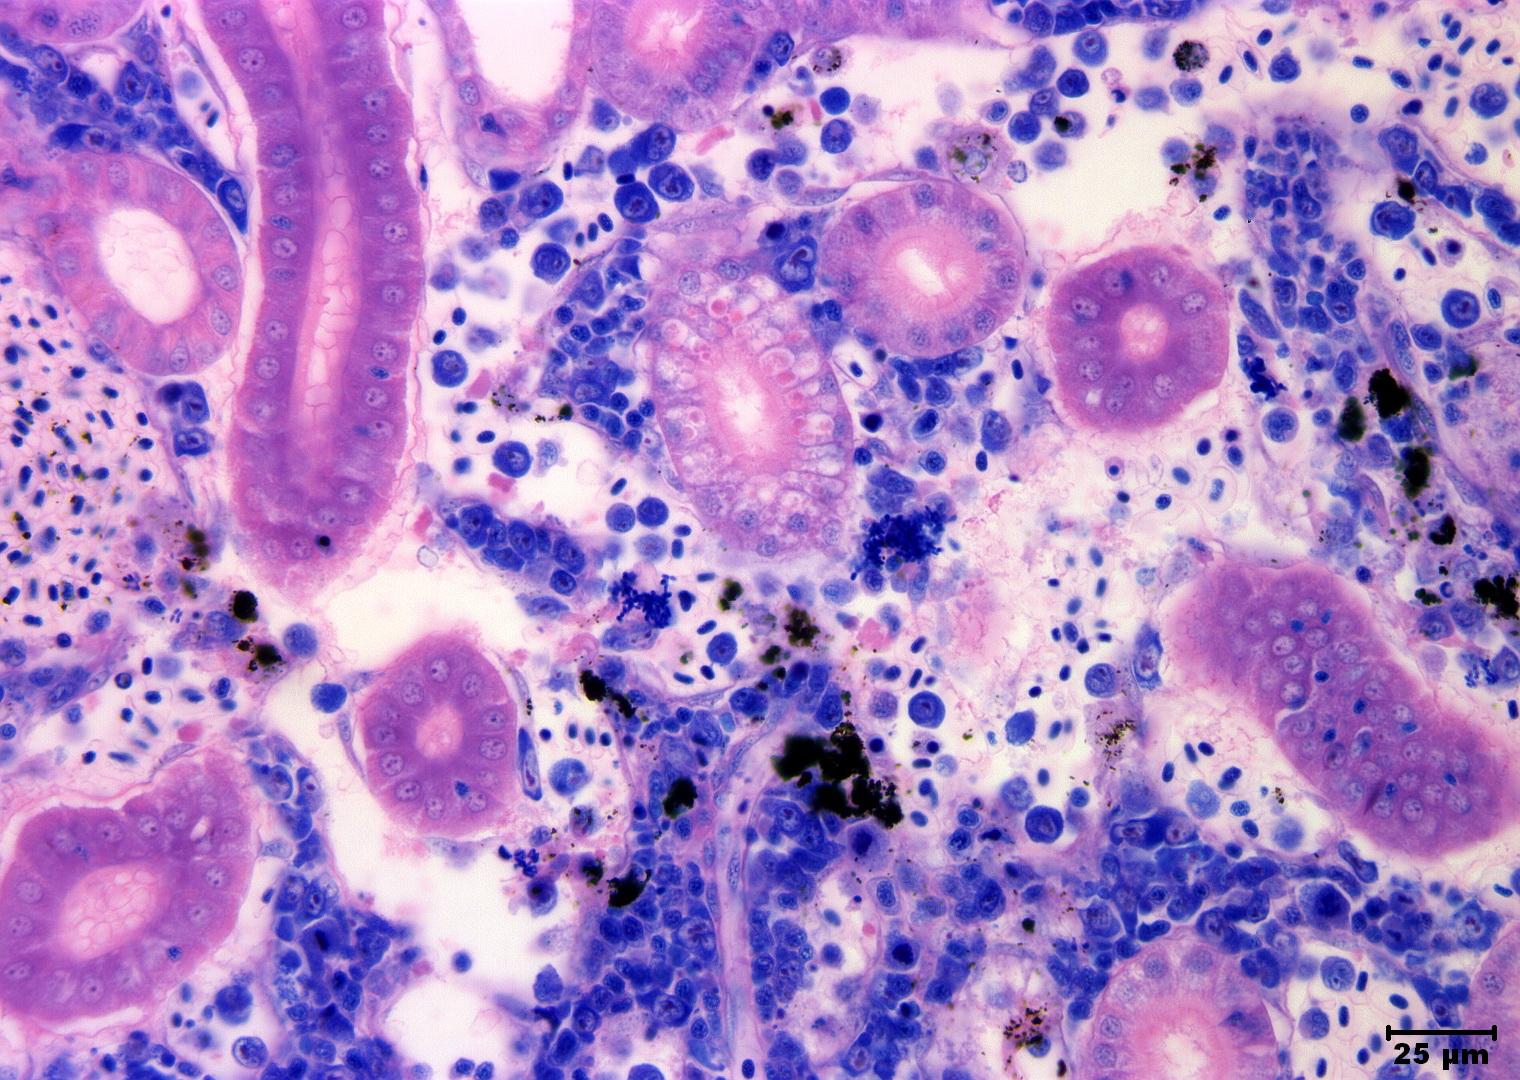 Slide 19 Kidney Aeromonas Salmonicida Giemsa 400xg Fish Pathogens